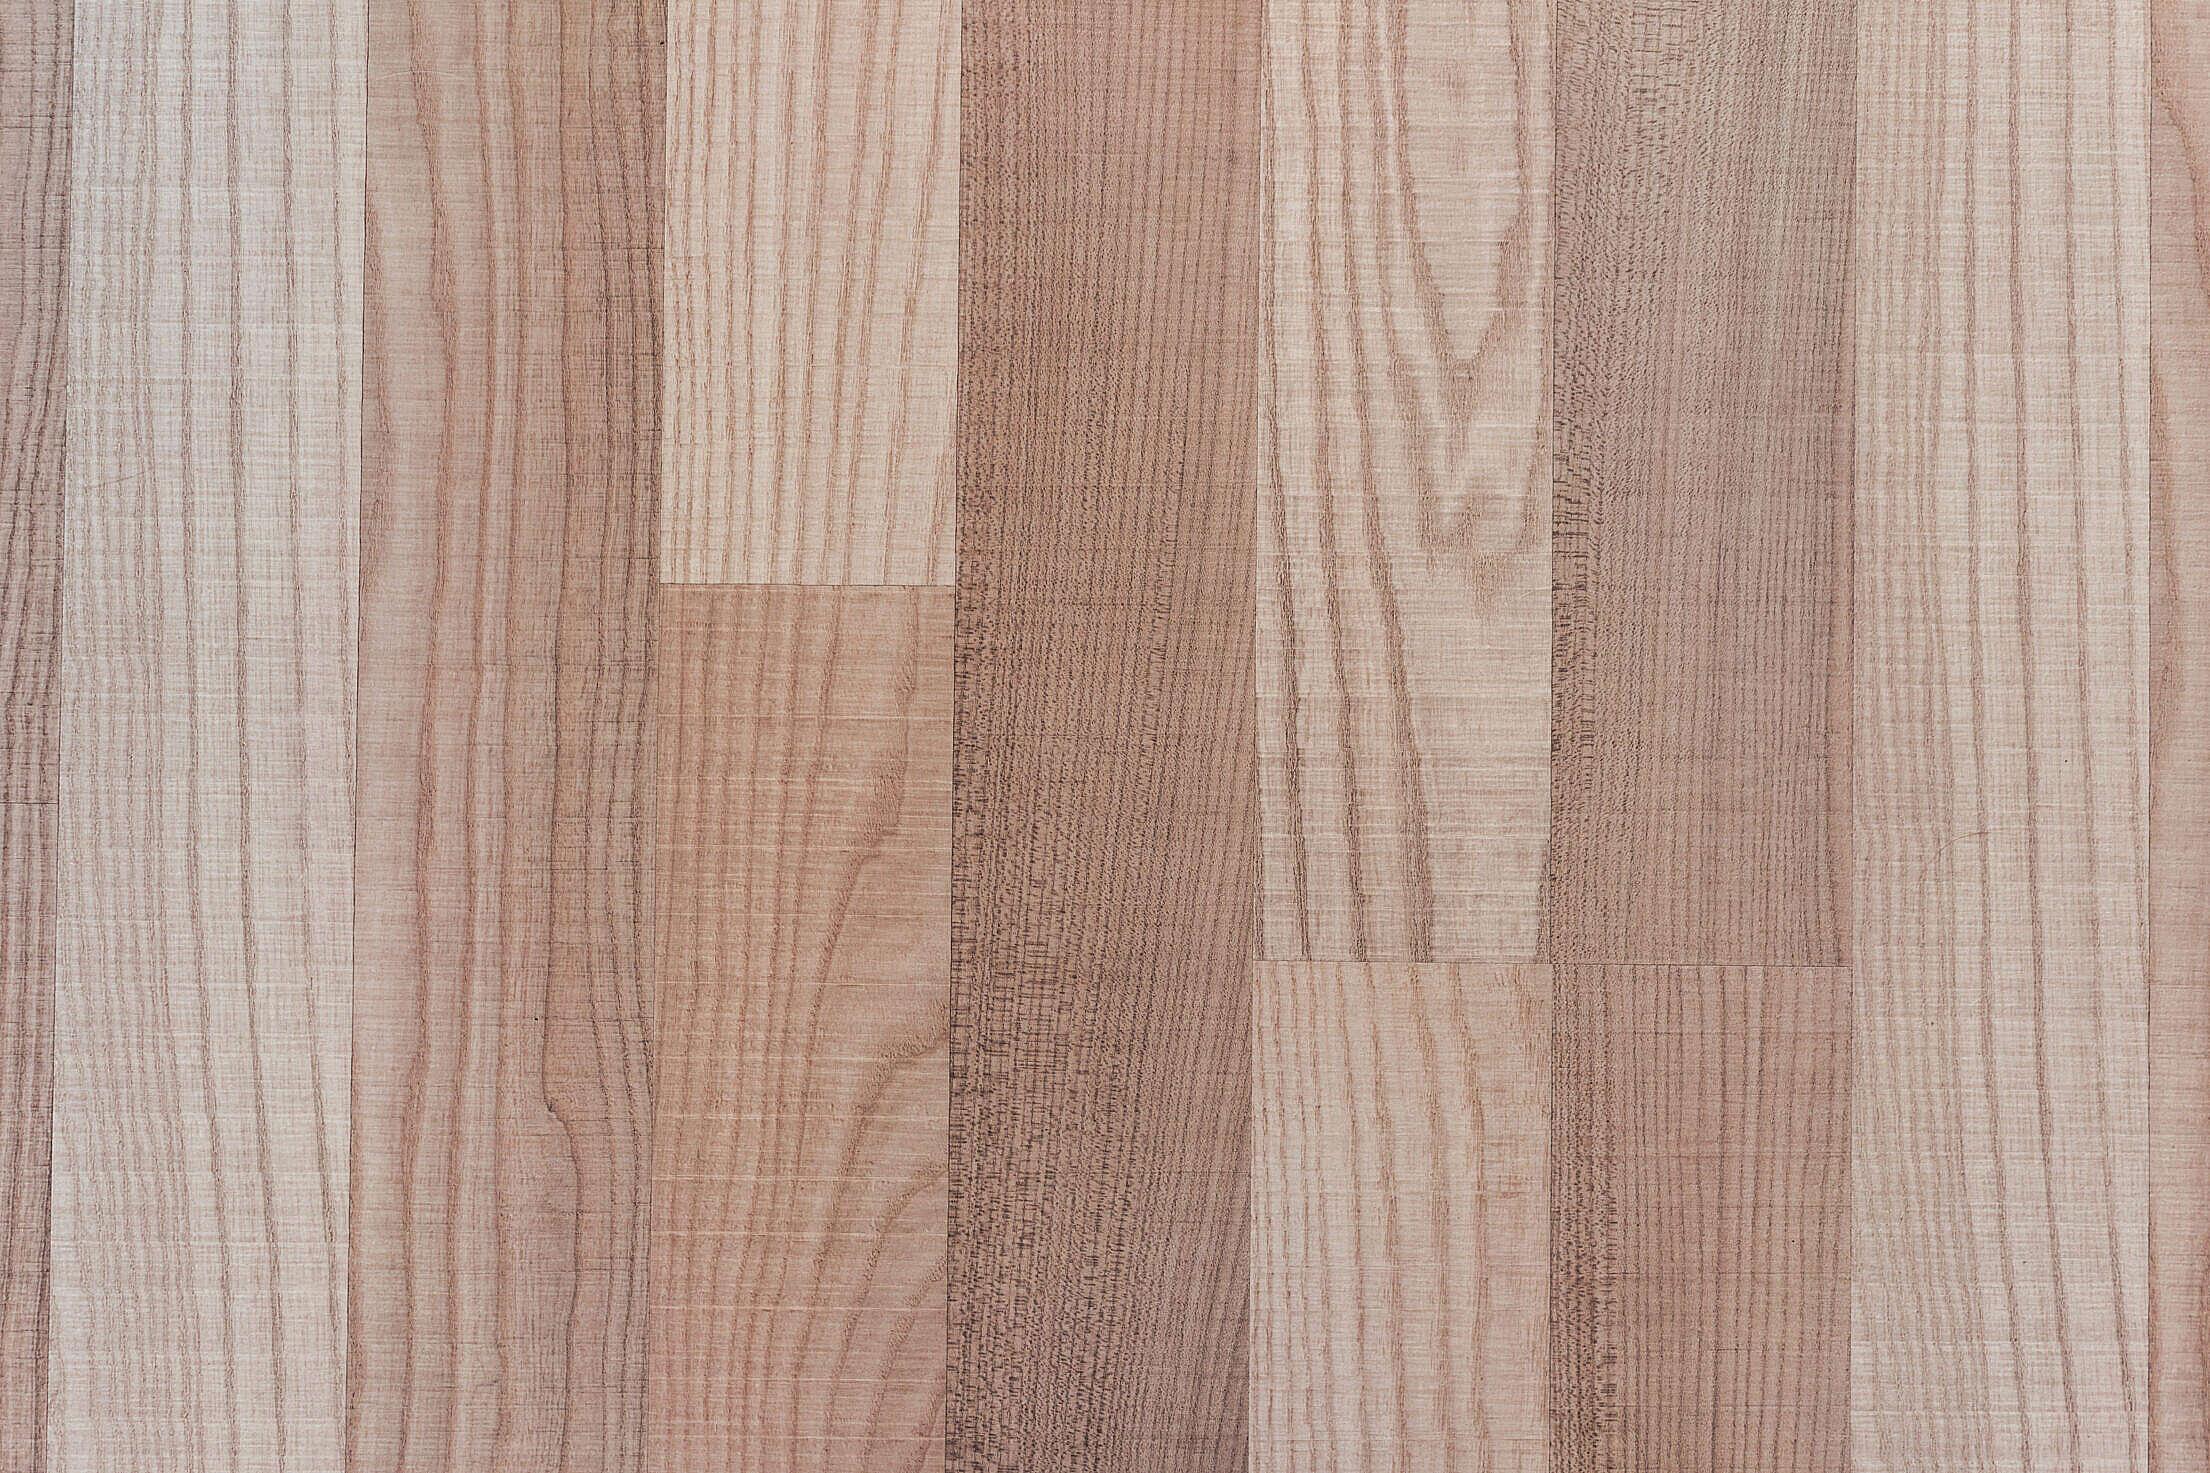 Realistic Wooden Home Tile Parquet Floor Imitation Decor Free Stock Photo